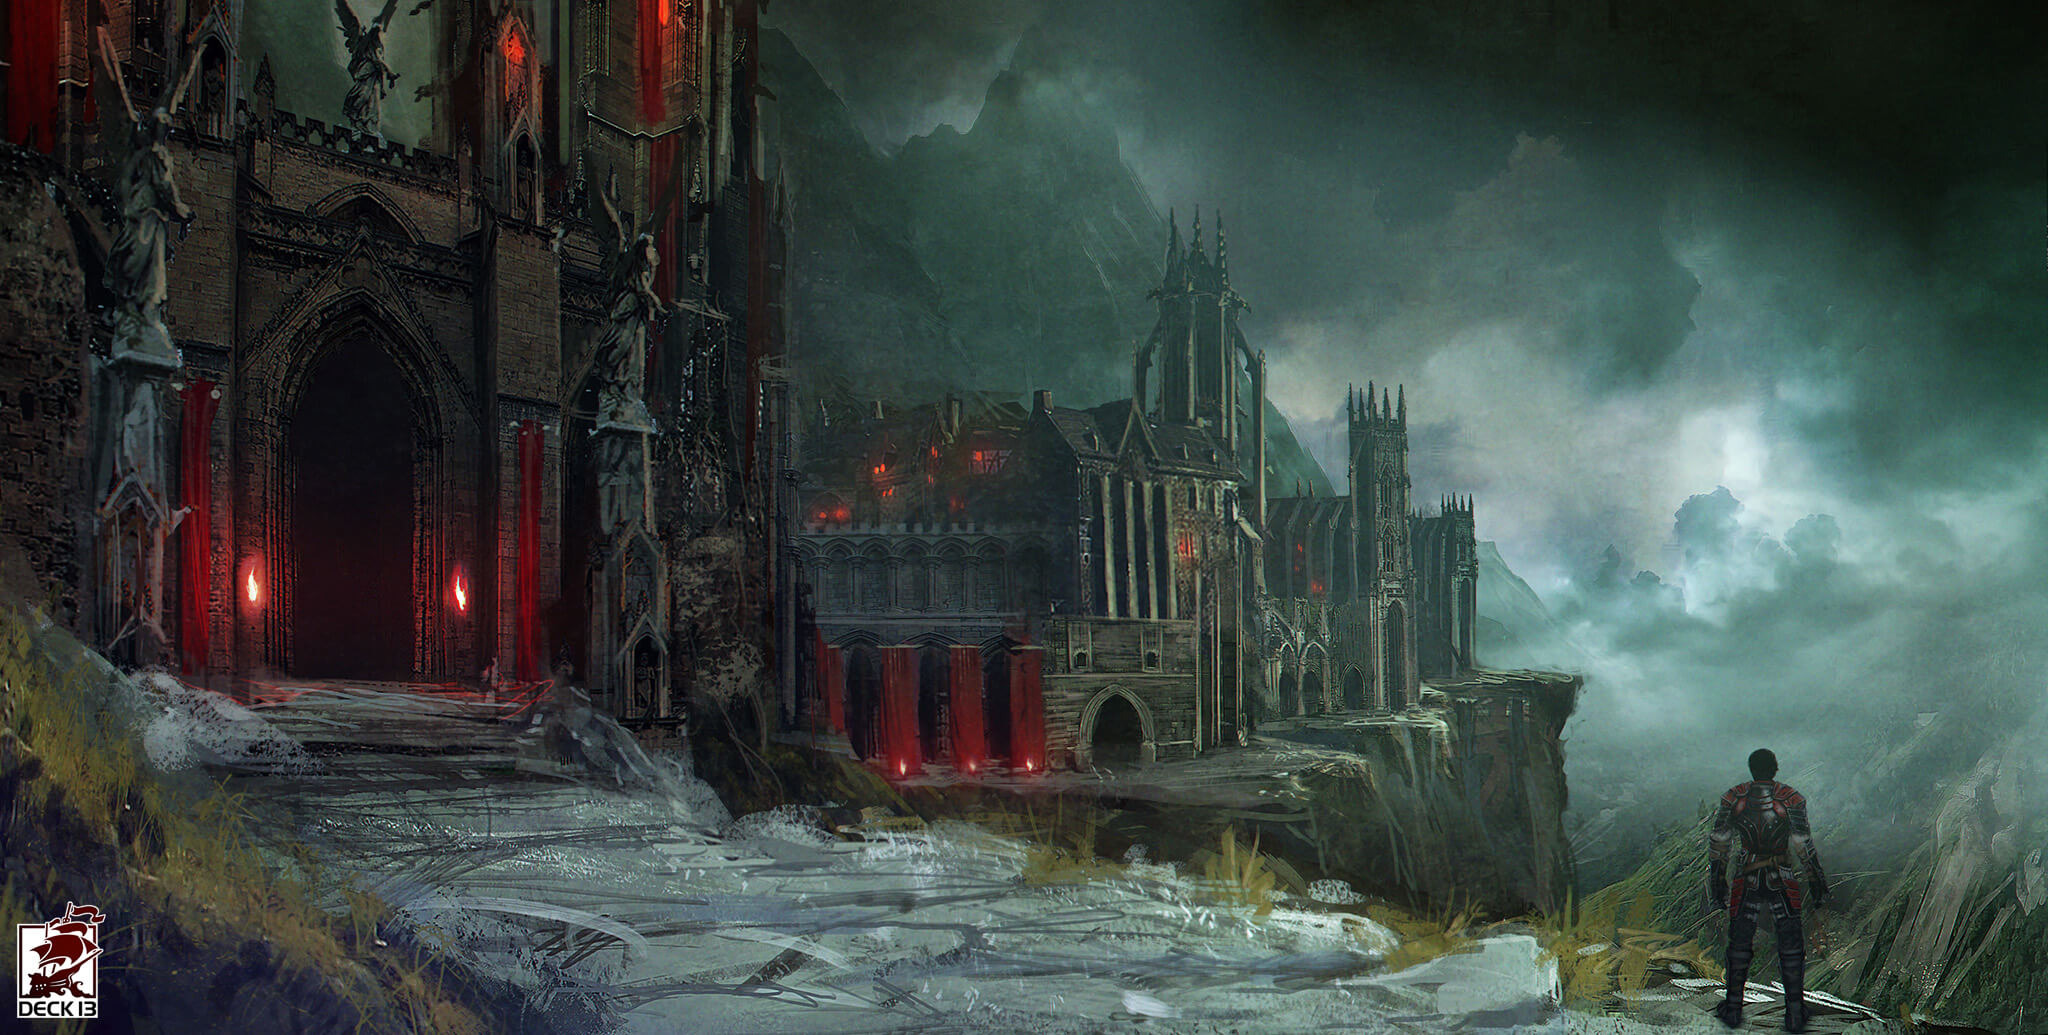 blood-knights-concept-art-felix-haas-mountain-peak-mood-003